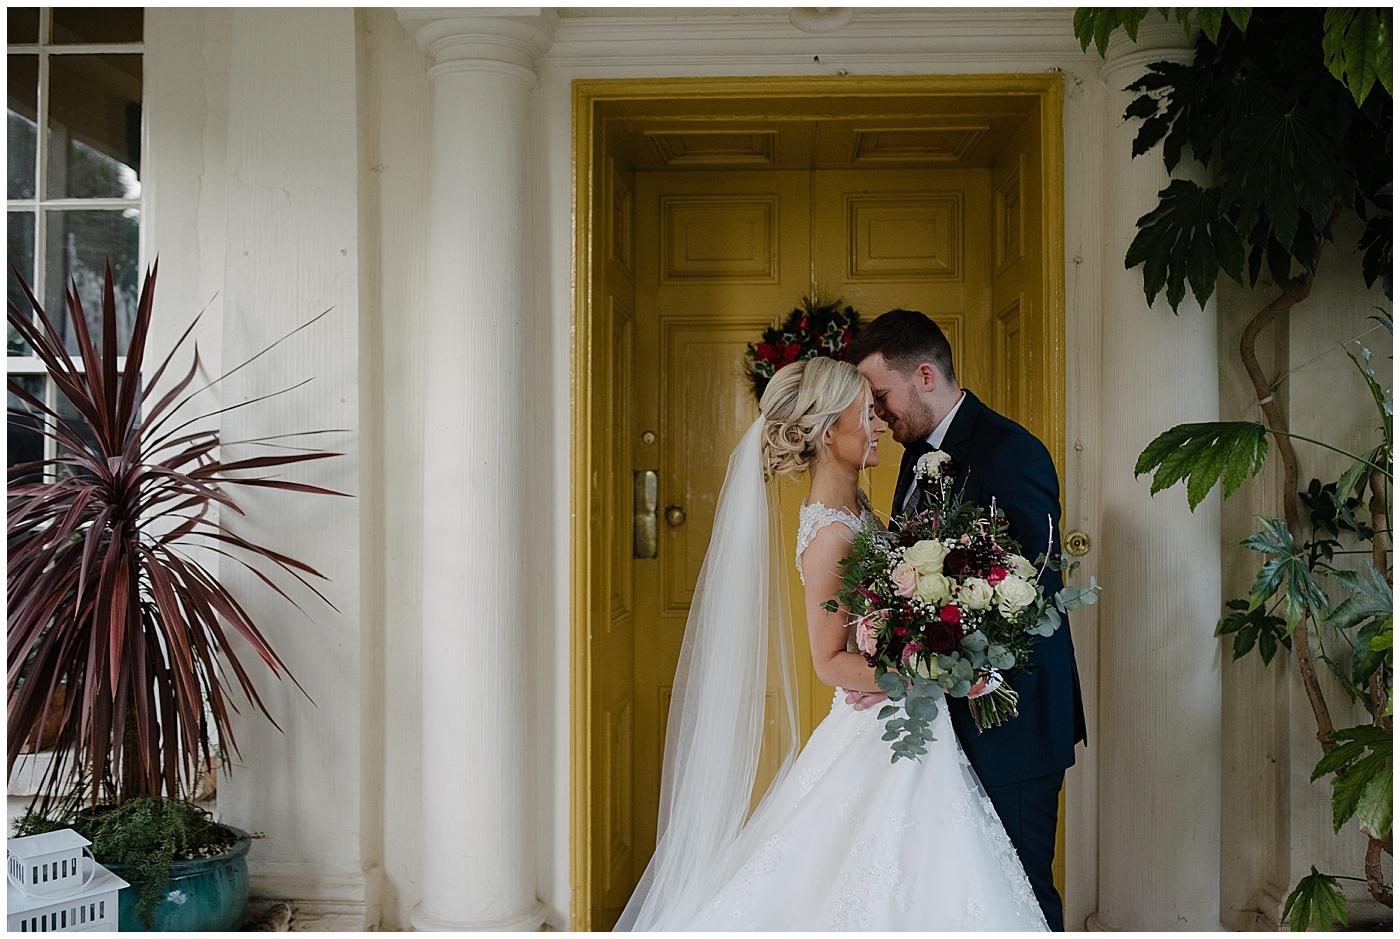 lissan-house-wedding-jude-browne-photography_0068.jpg